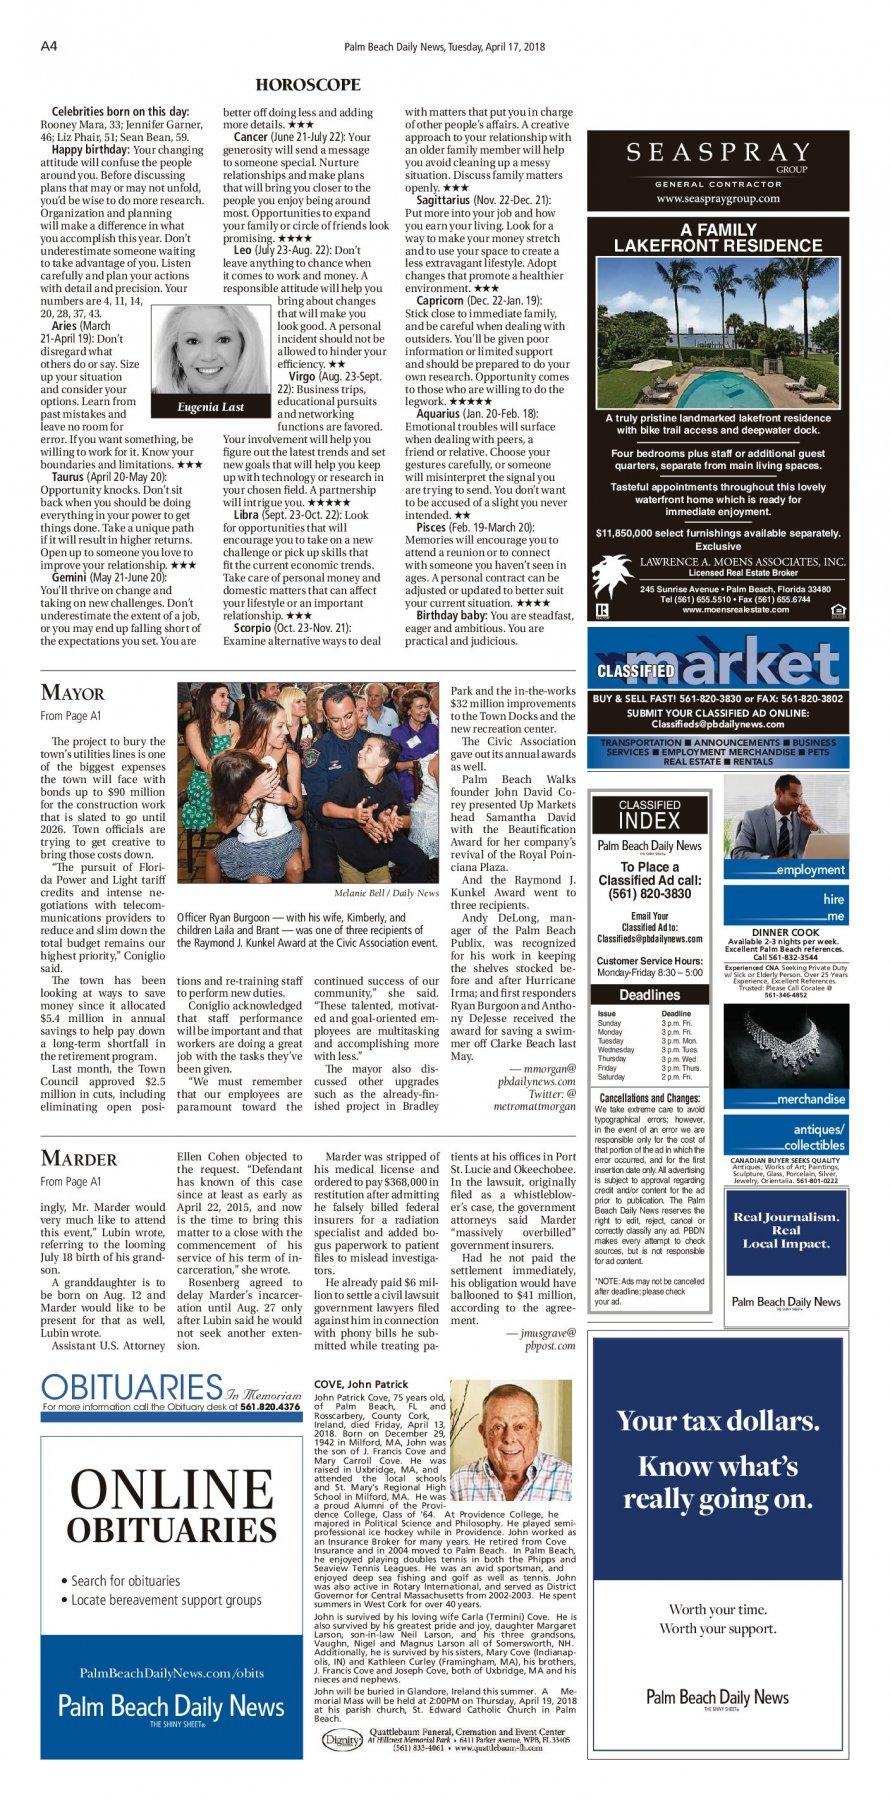 Palm Beach Daily News/The Shiny Sheet: